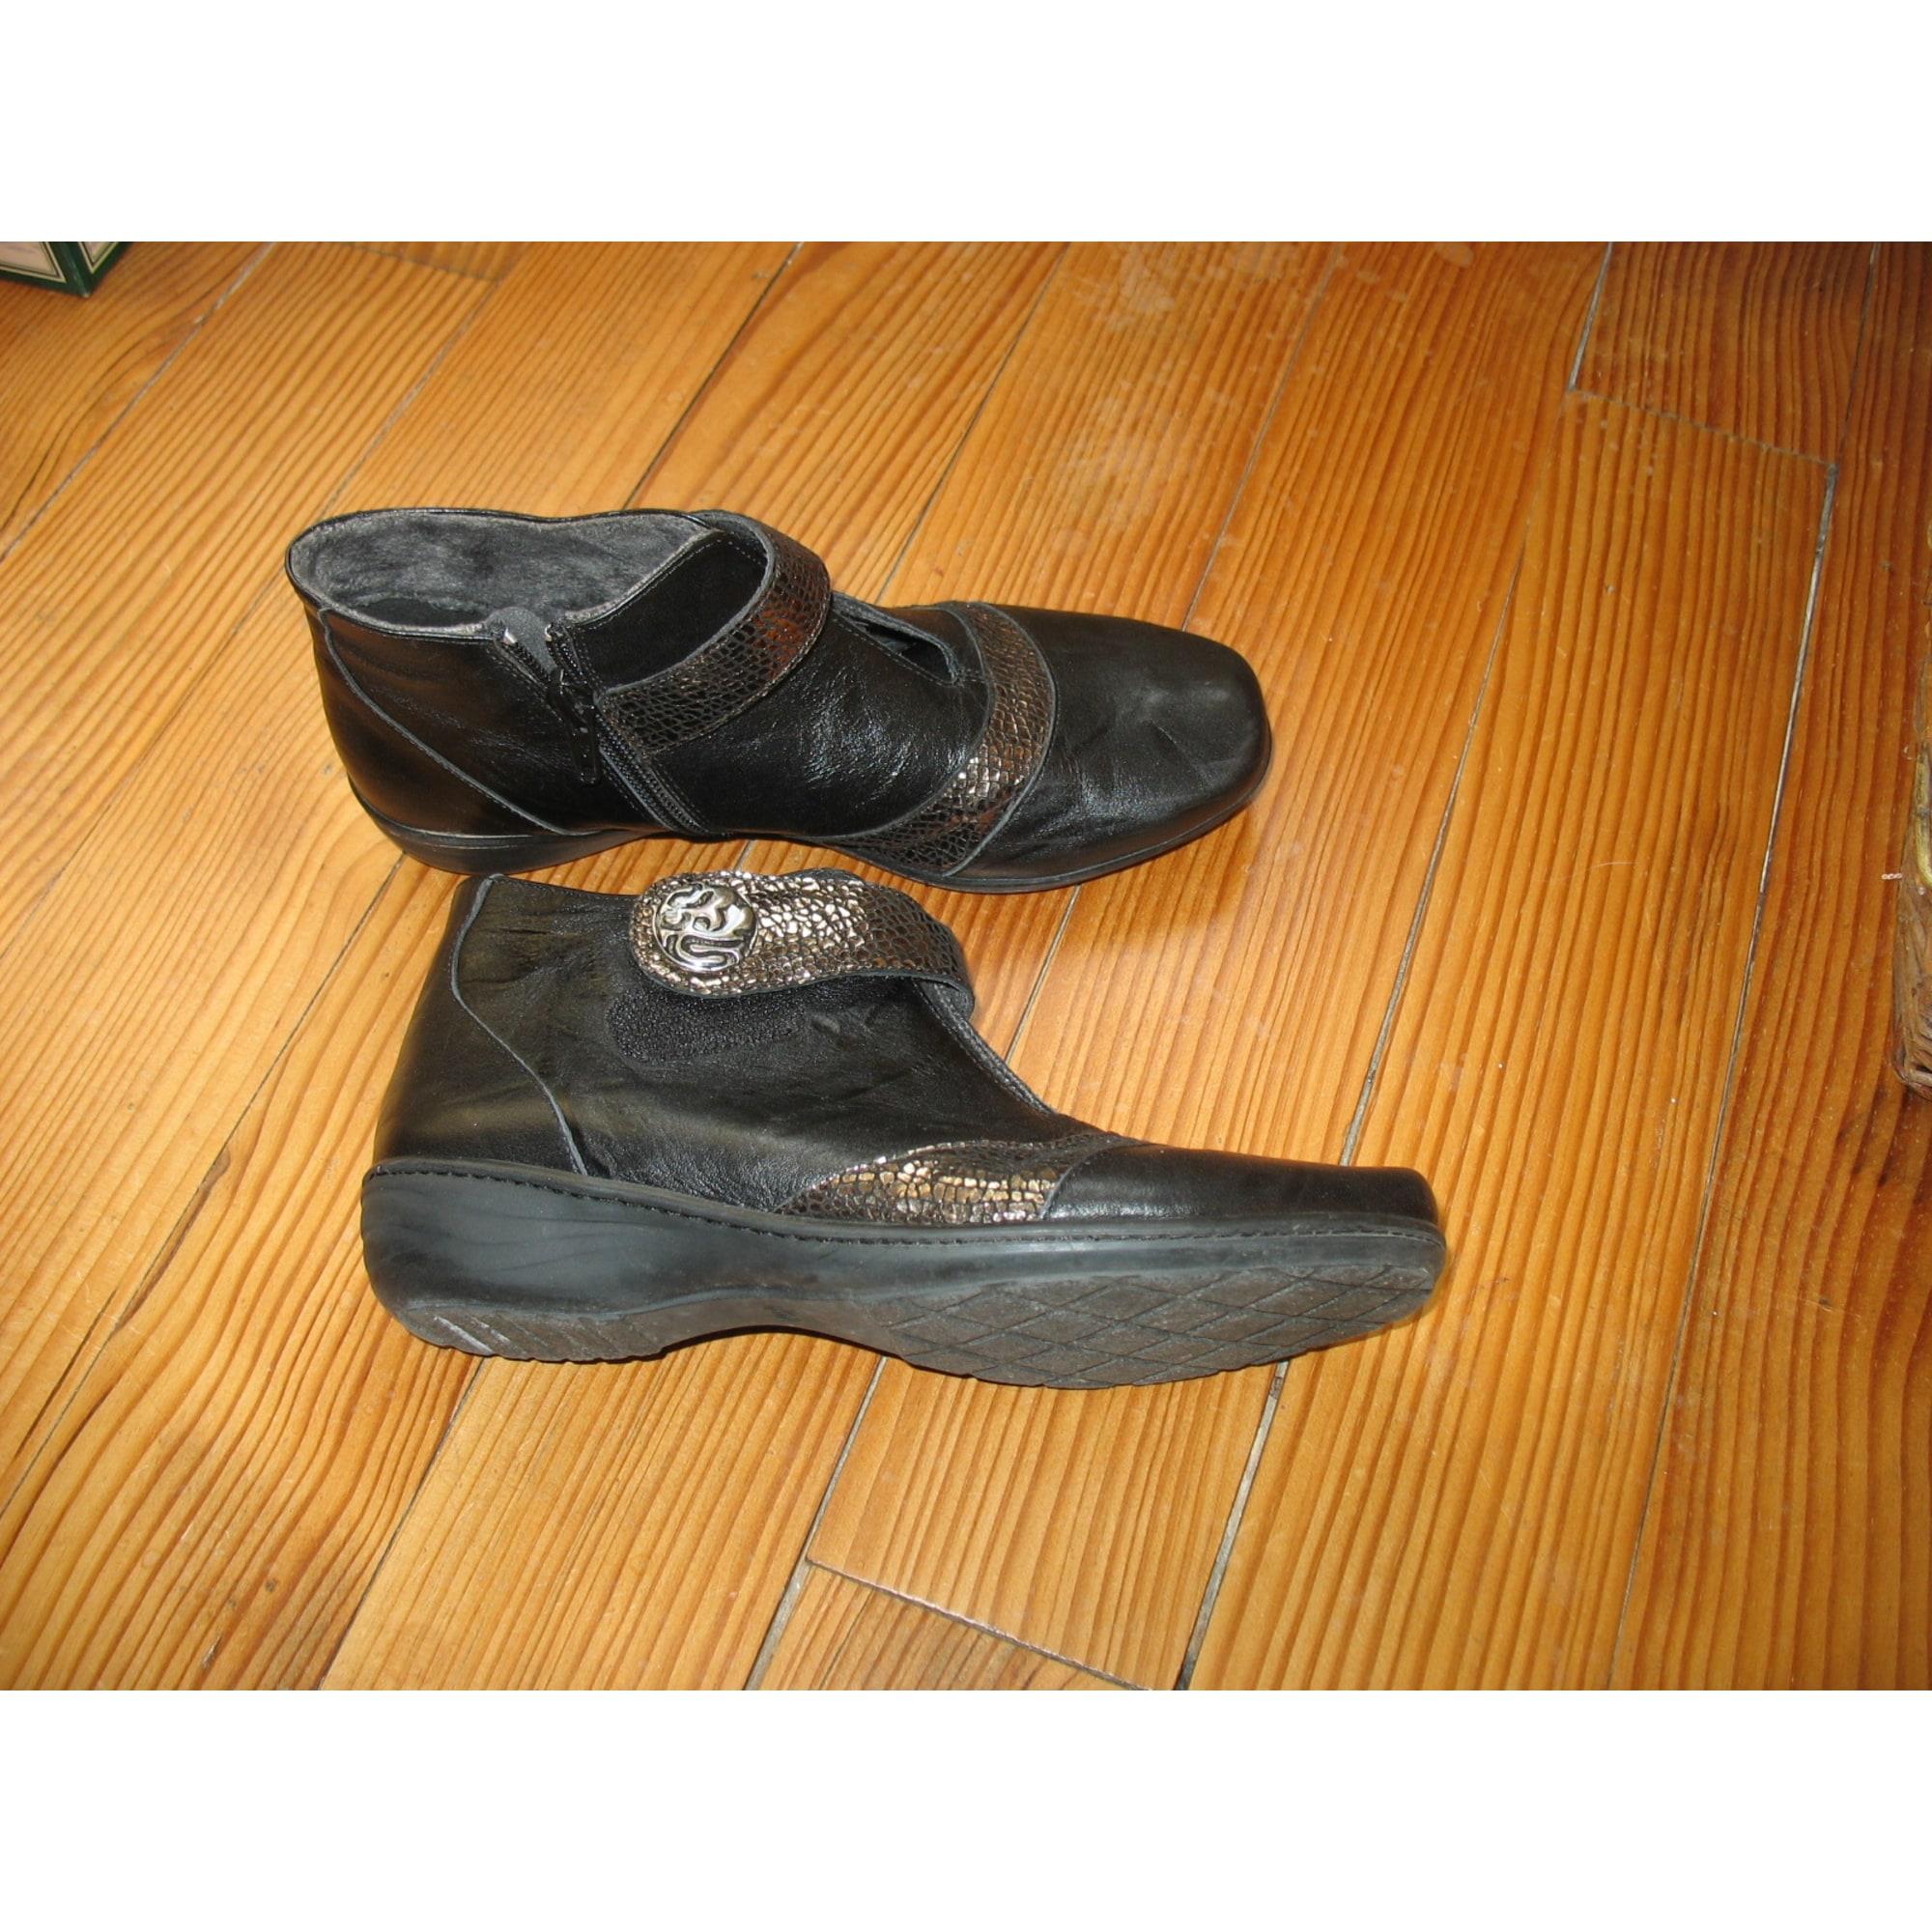 Bottines & low boots plates GEO REINO Marron